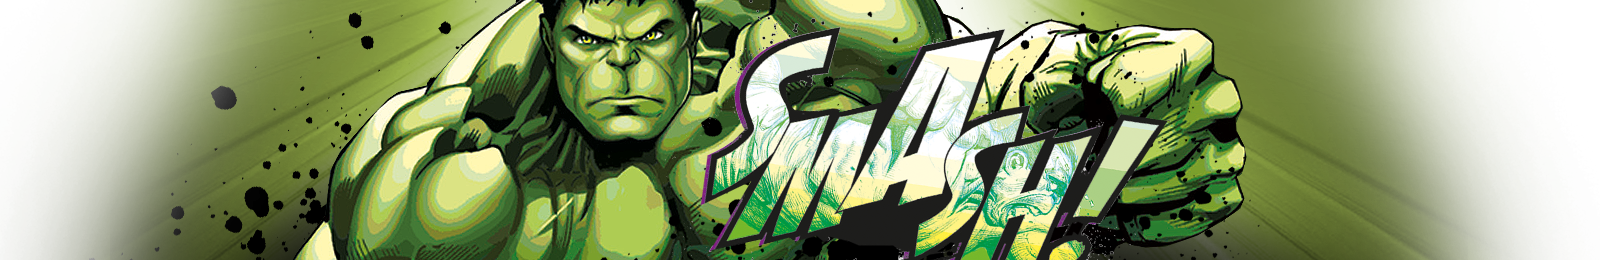 hulk_header5